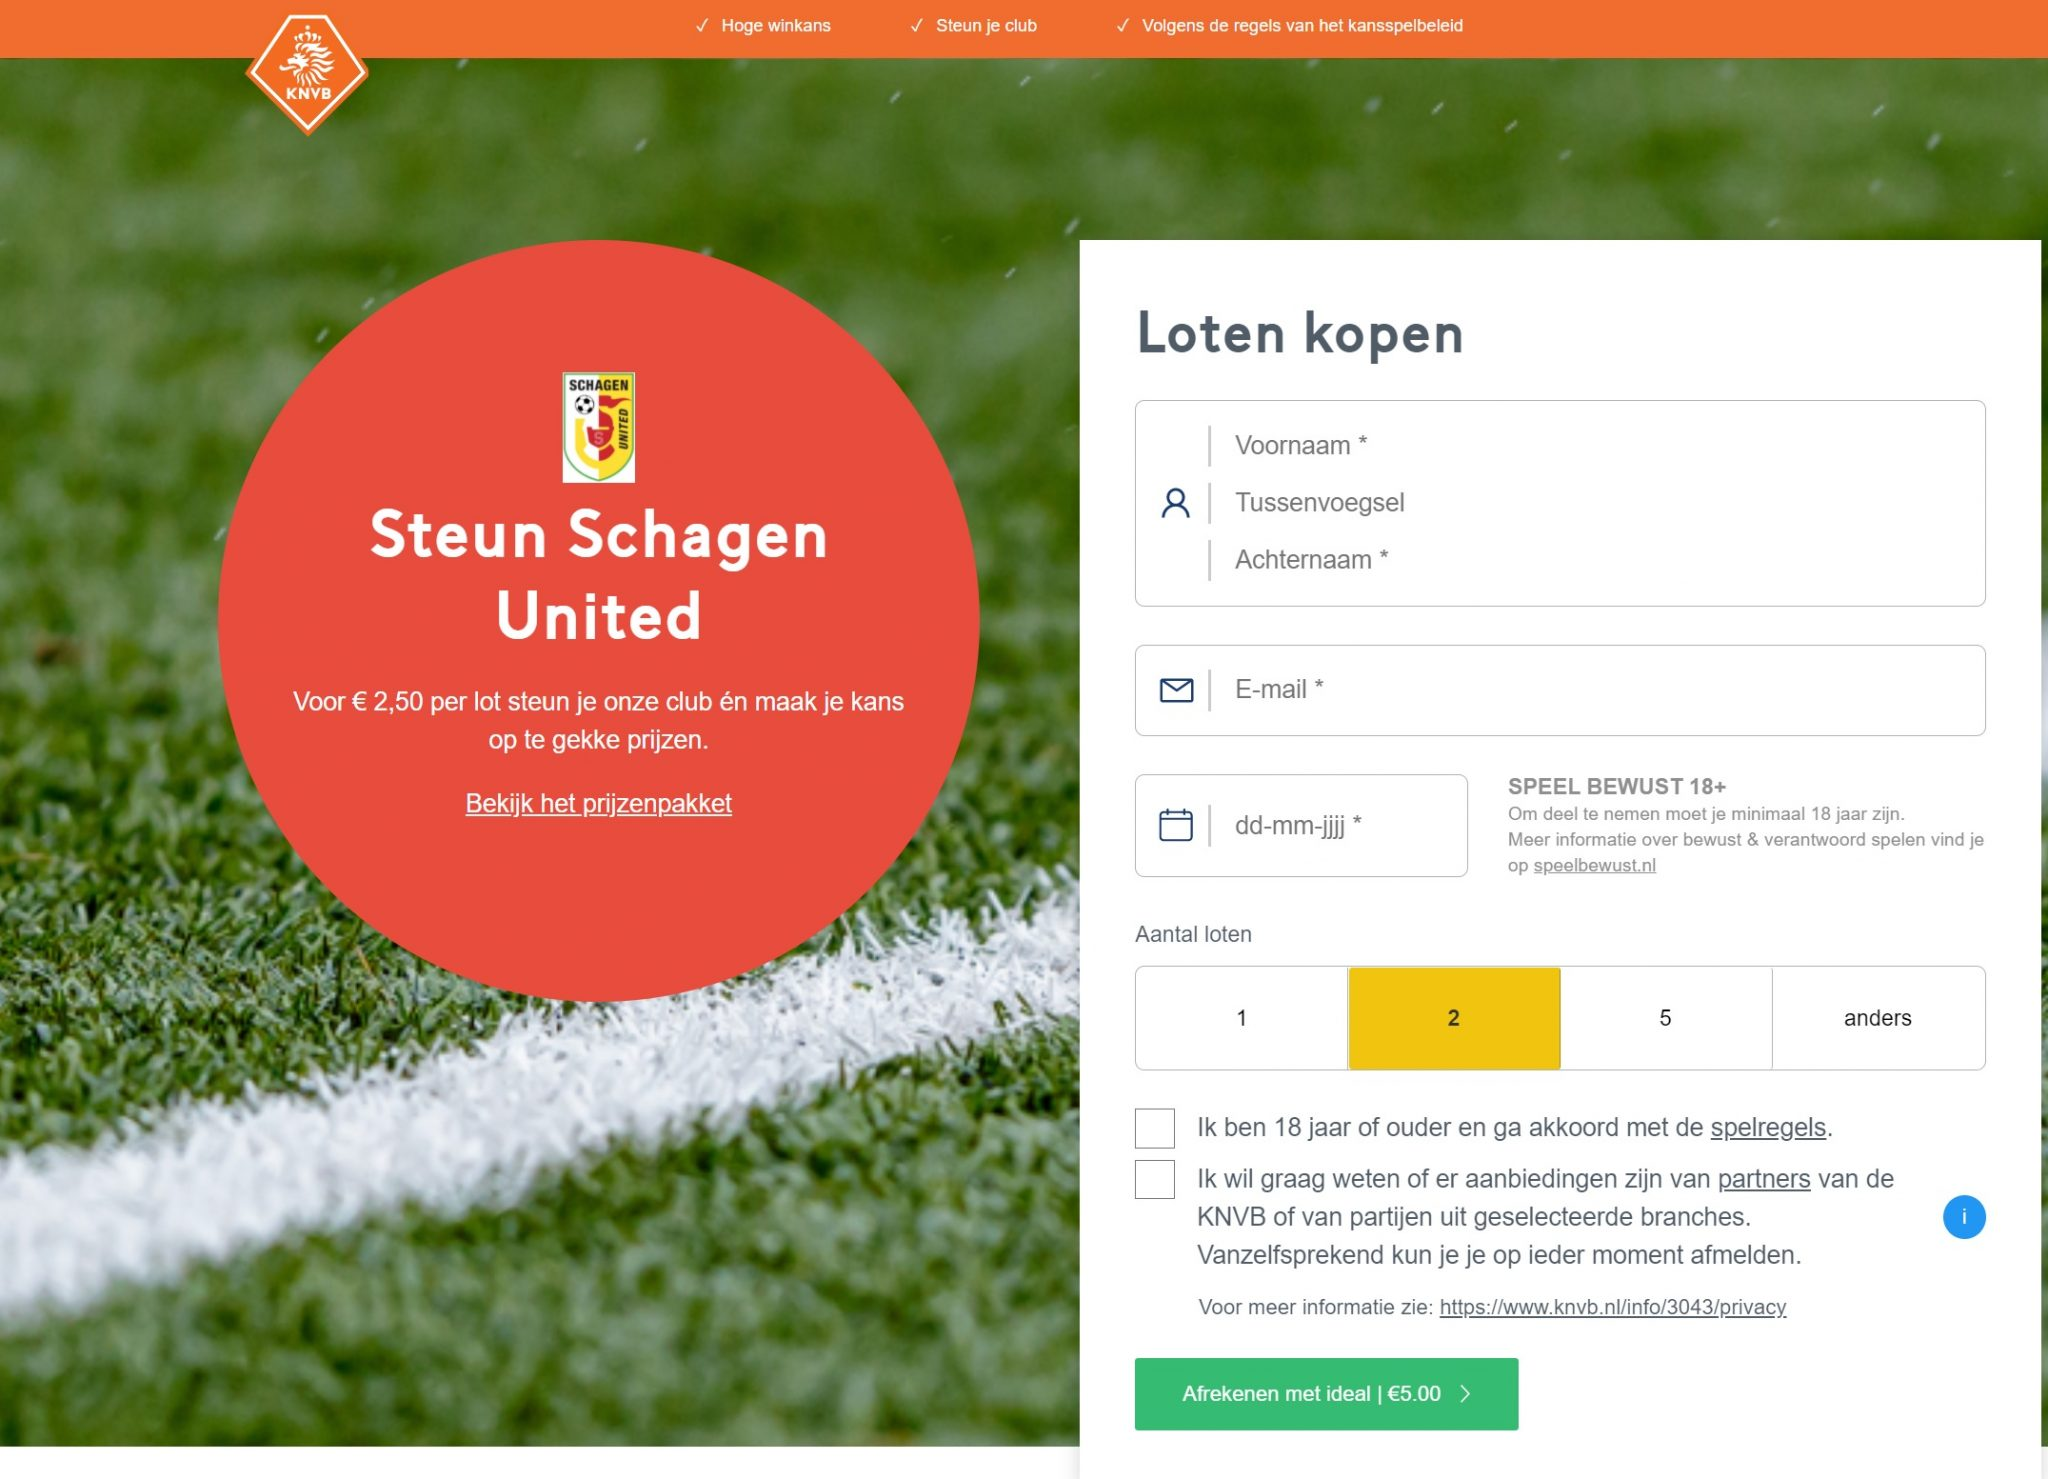 Amateurvoetballoterij van de KNVB